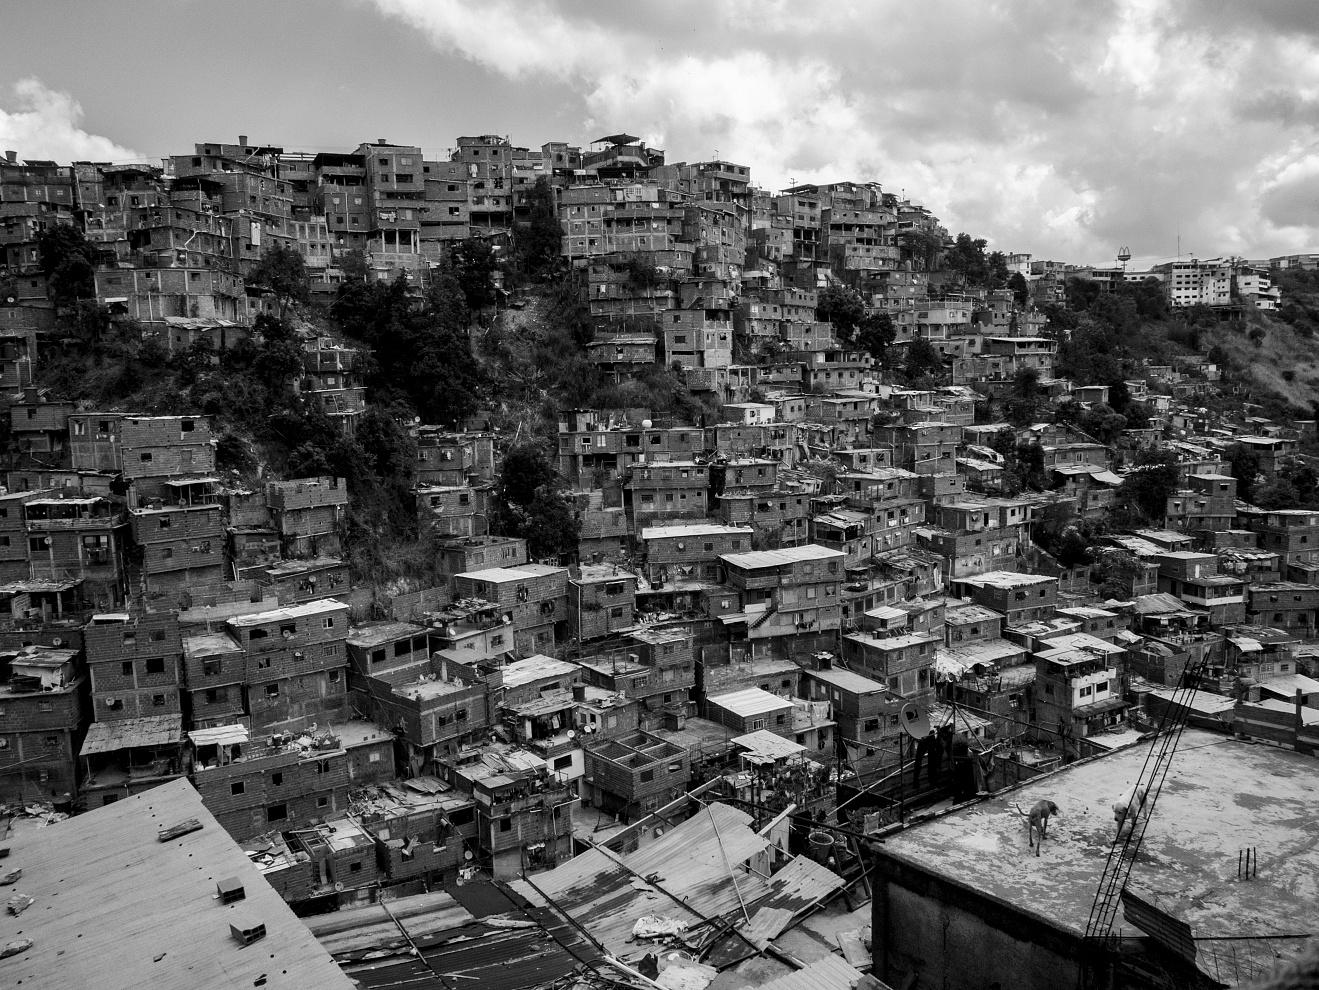 Venezuela; Miranda; Petare; 2015  View of a Barrio of Petare. The high density slum extends both vertically and horizontally with precarious and unstable shacks.